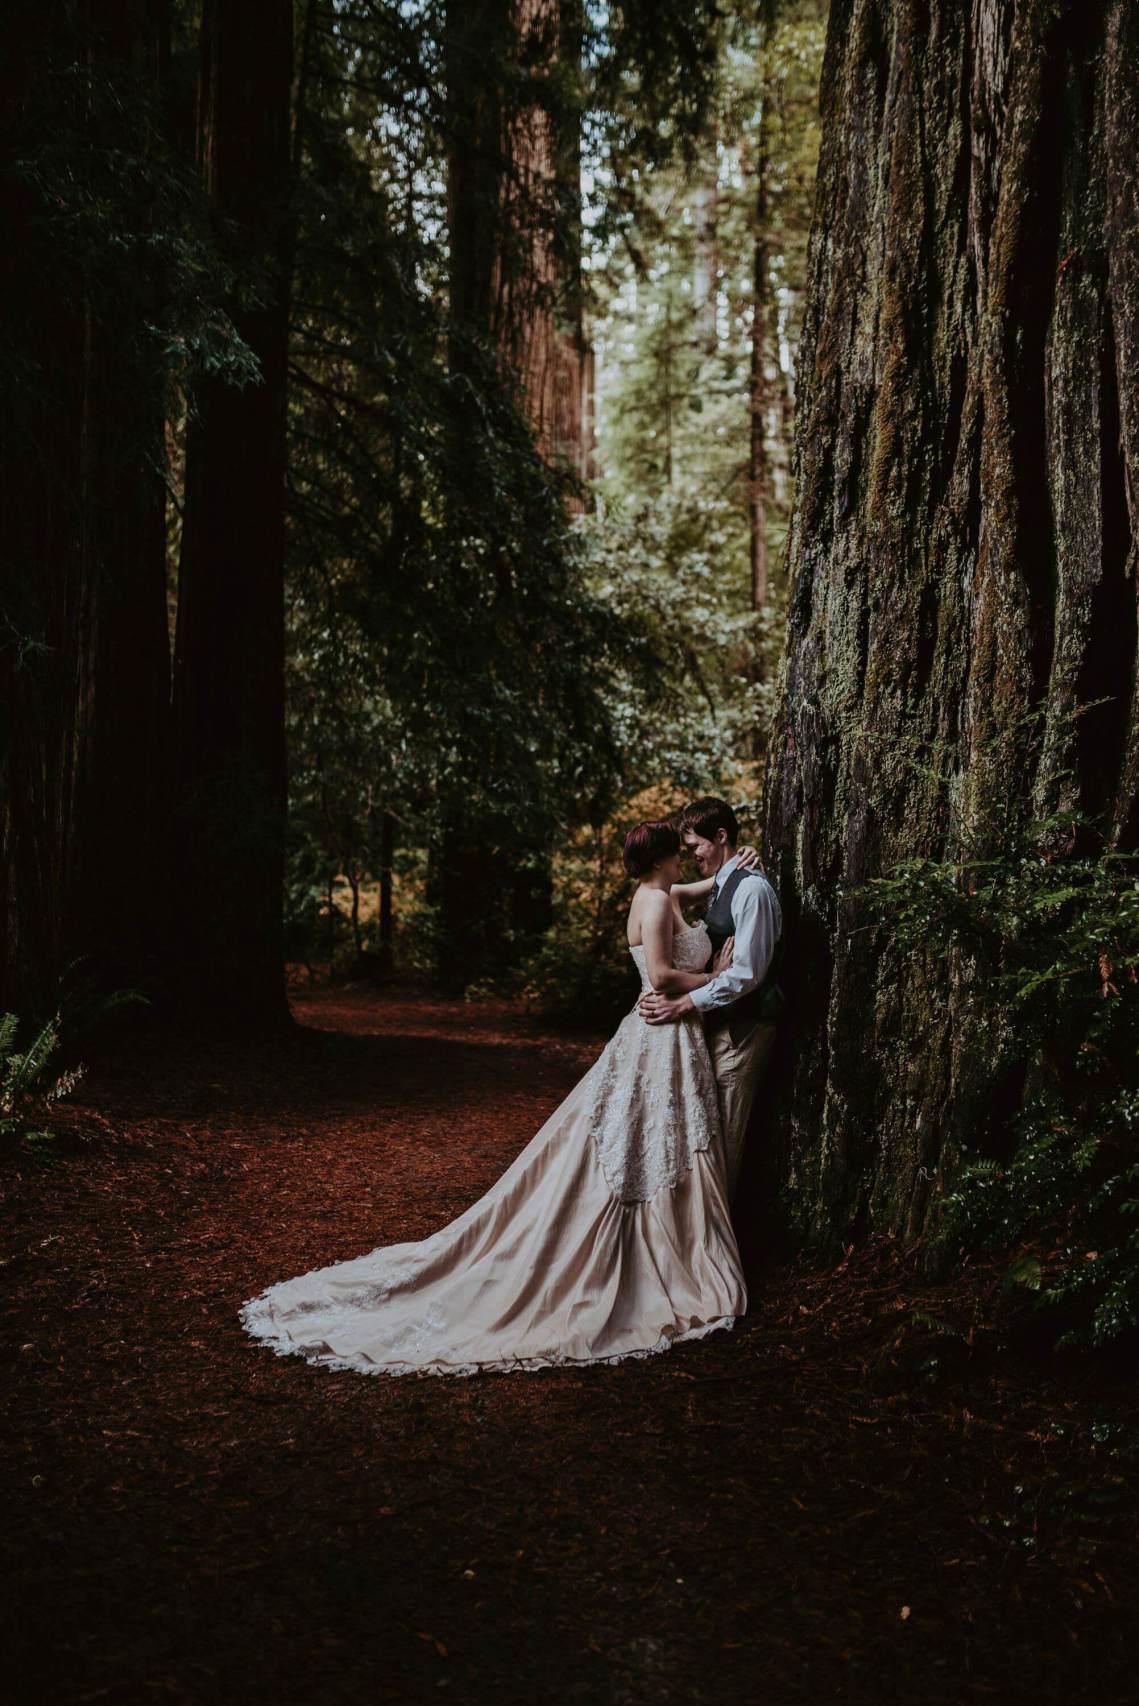 S Photography Pacific Northwest Adventure Photographer - California Redwoods Elopement